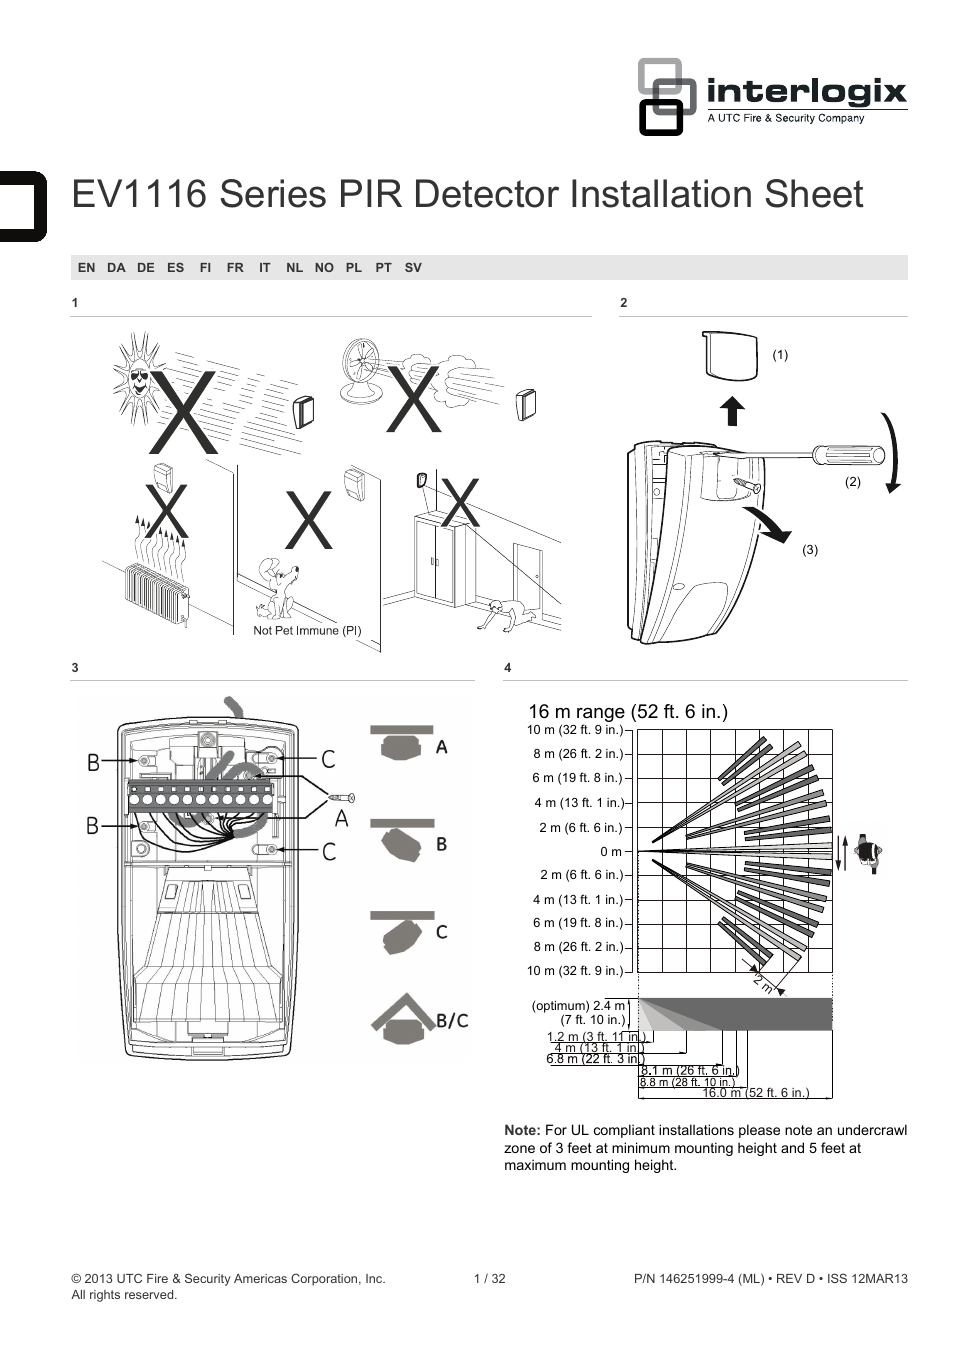 interlogix ev1116 user manual